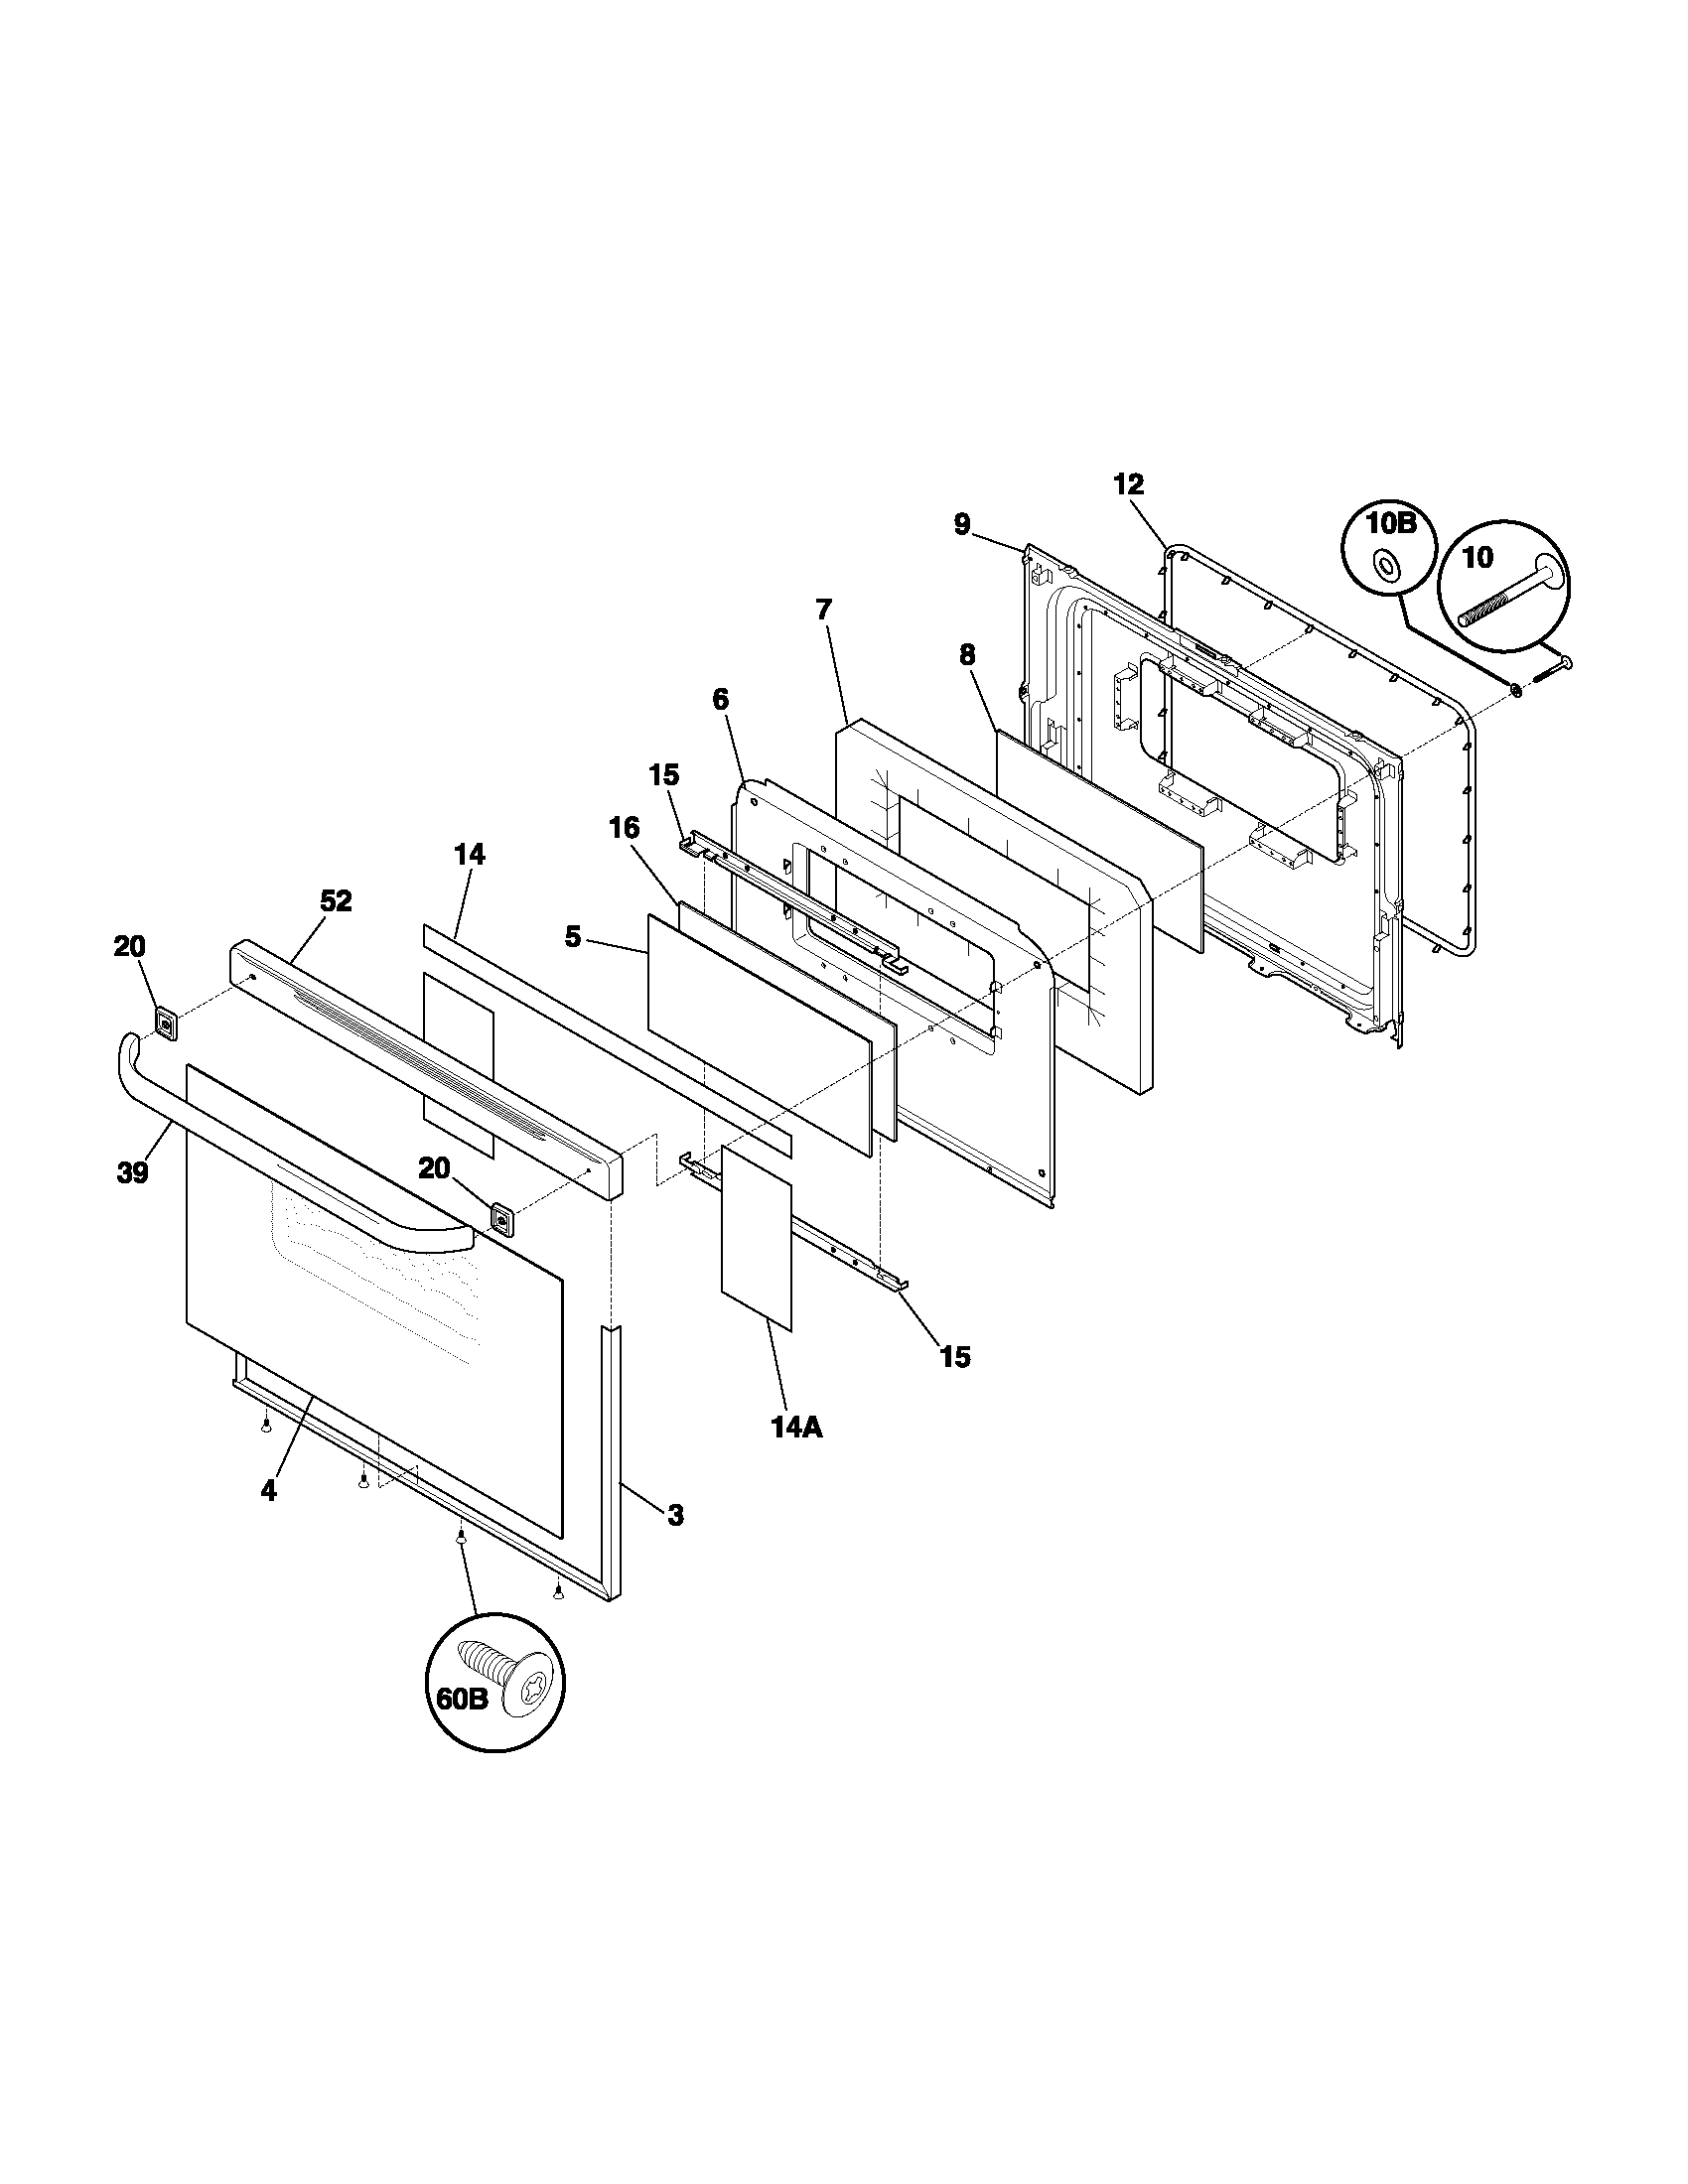 hight resolution of fef352asf electric range door parts diagram wiring schematic parts diagram